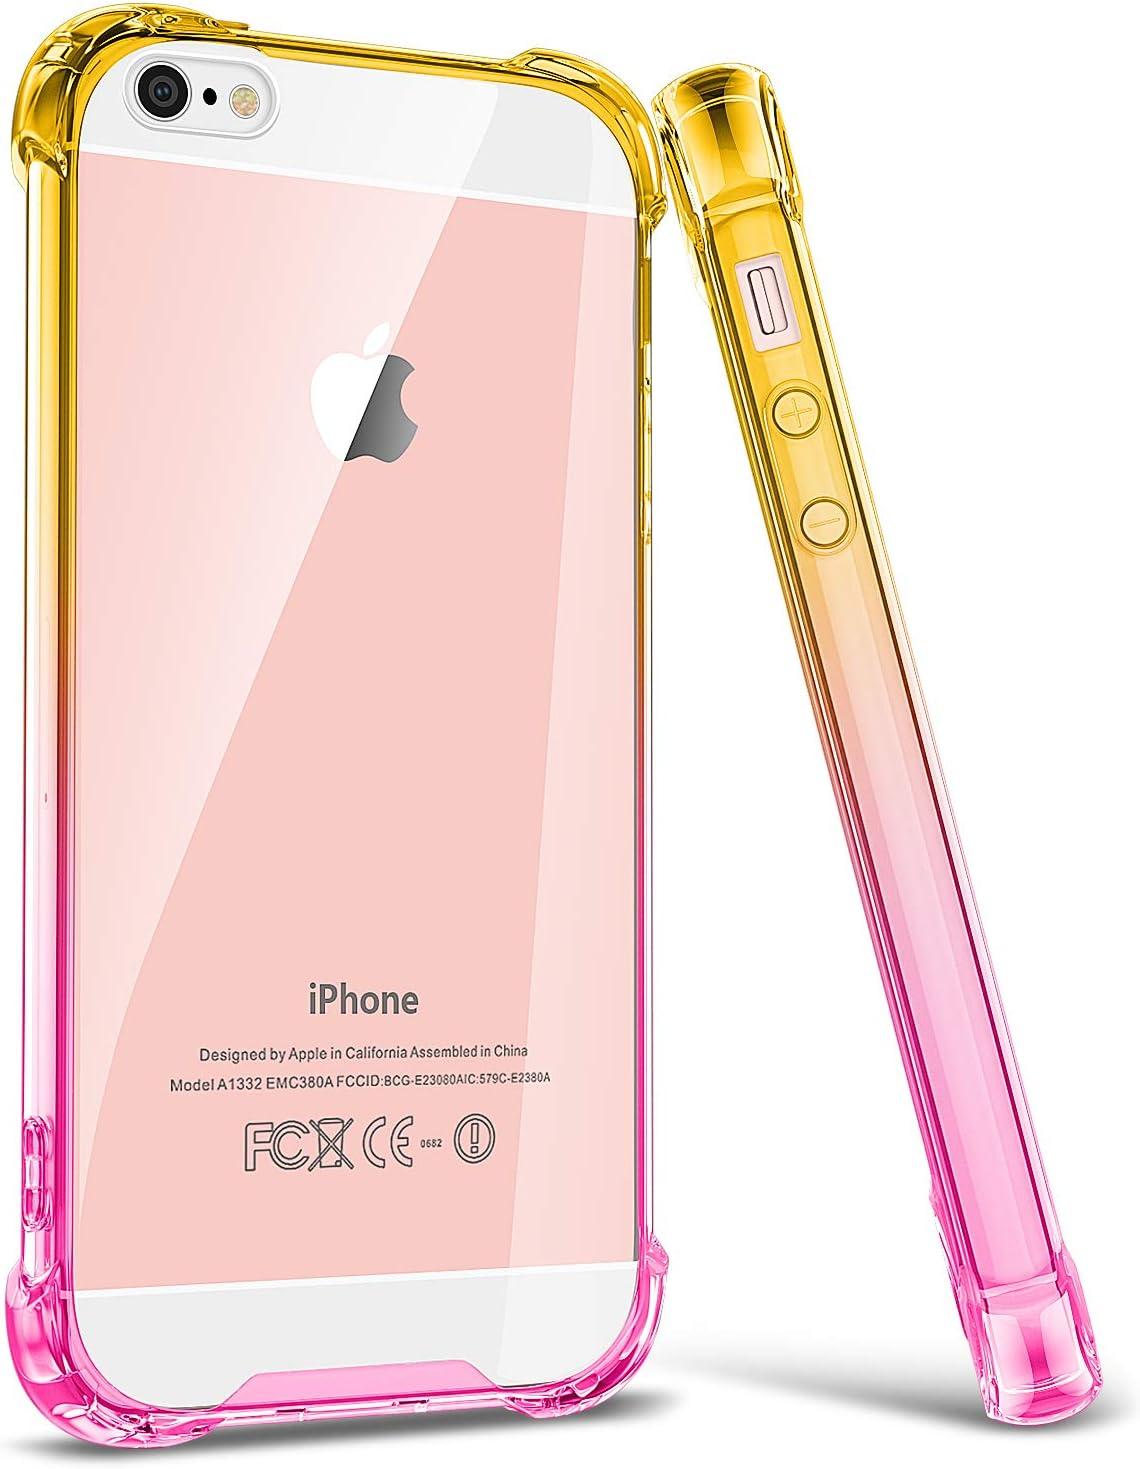 iPhone SE Case, Ansiwee Reinforced Anti Scratch Slim Cute Clear iPhone SE Phone Case Cover Colorful TPU Bumper Shock Absorption Protective Cases for iPhone SE iPhone 5 iPhone 5s (Yellow Pink)